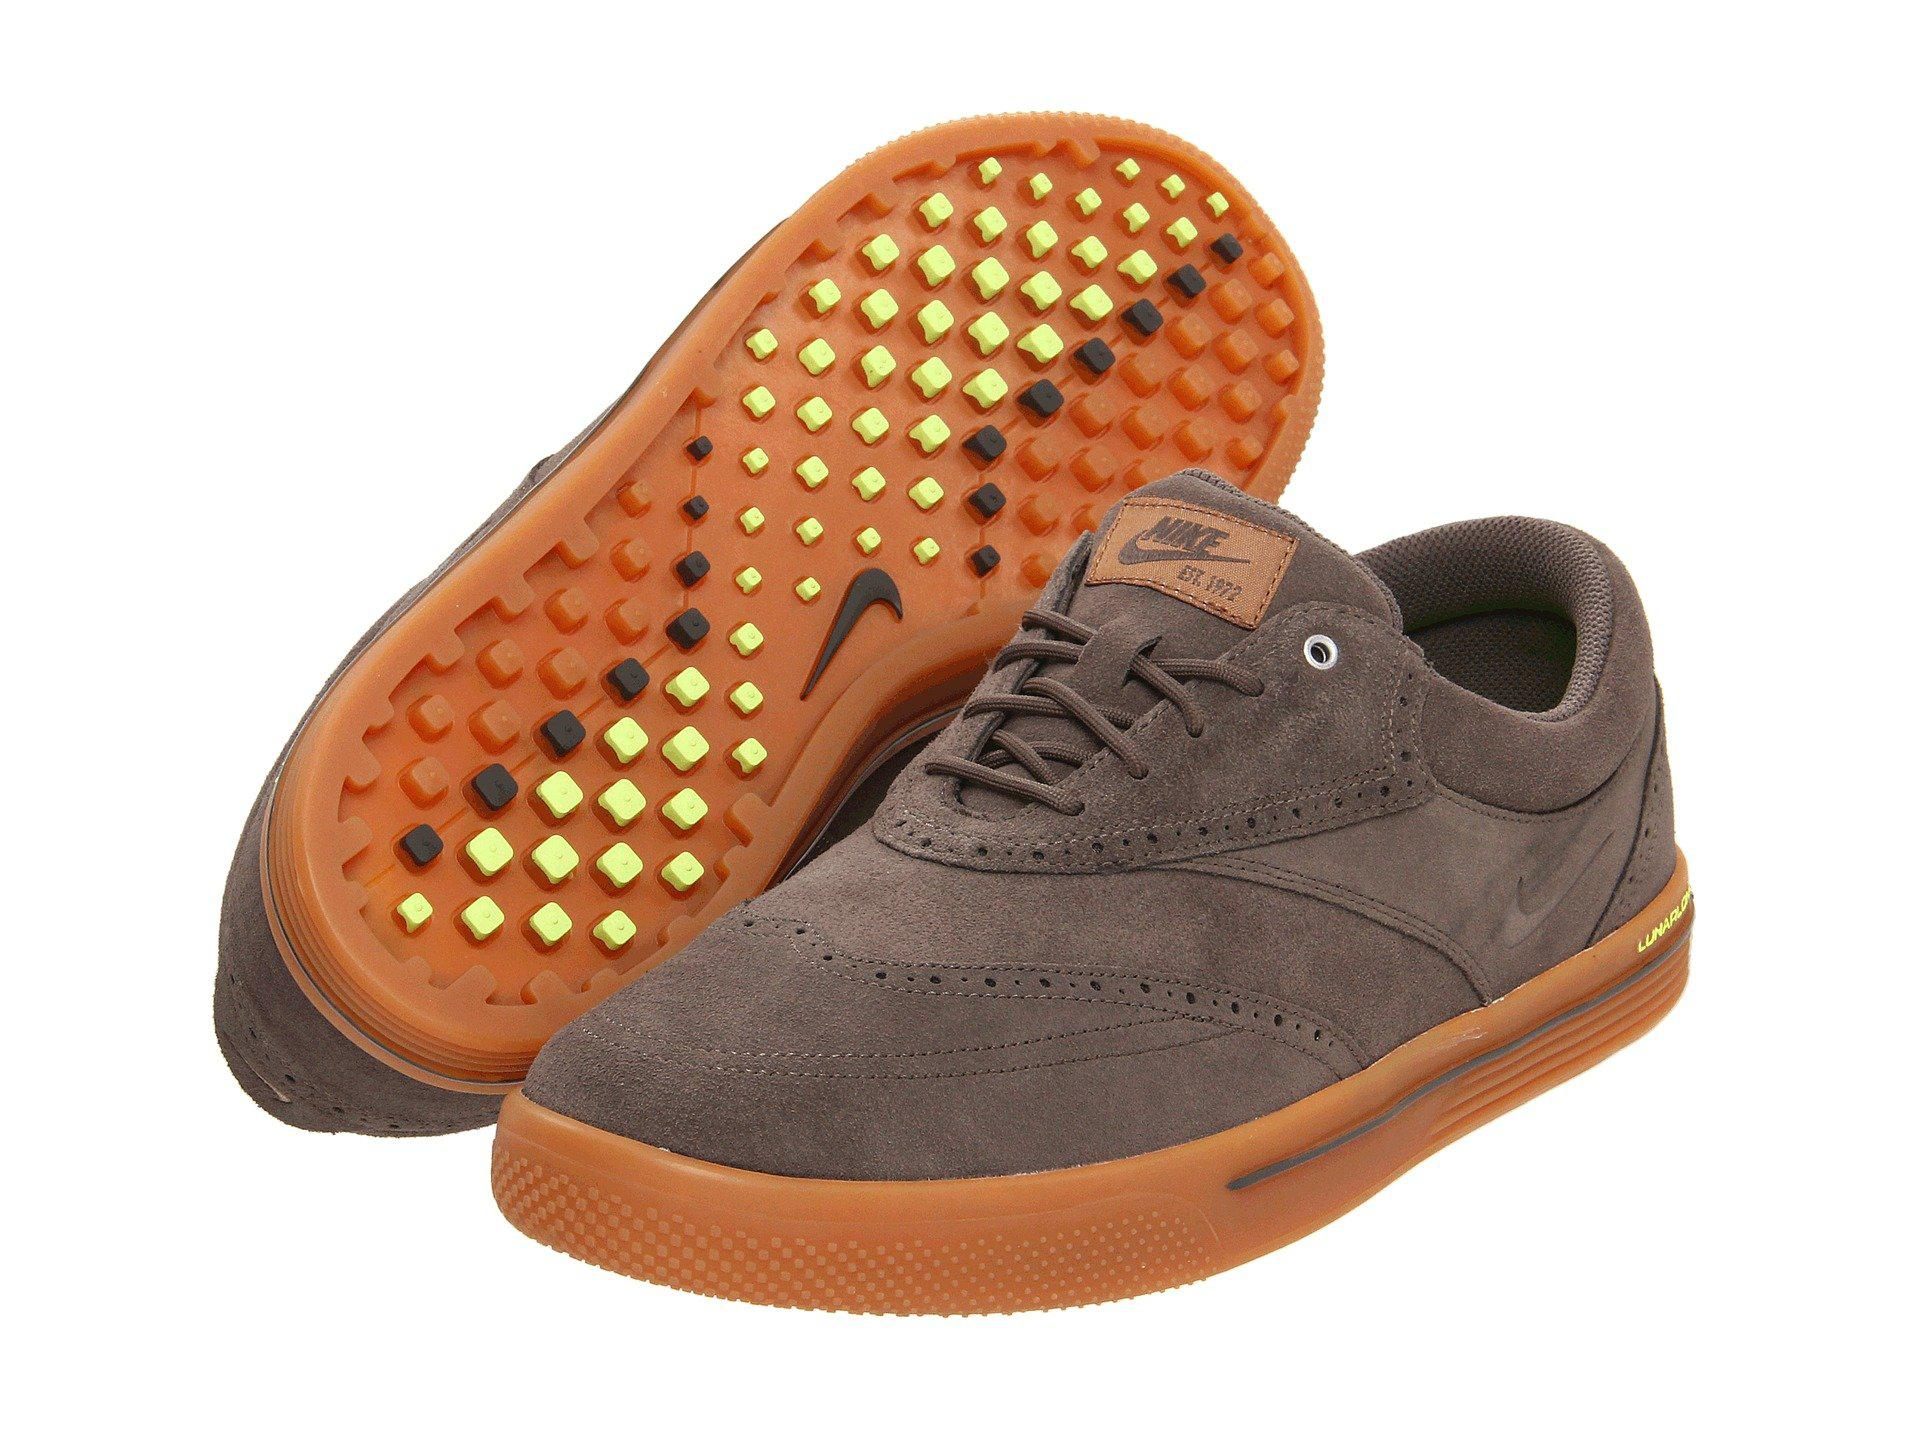 reputable site bfdf3 c376a Mens Lunar Swingtip Canvas Golf Shoes · Nike ... Lyst - Nike Lunar Swingtip  - Suede for Men ...